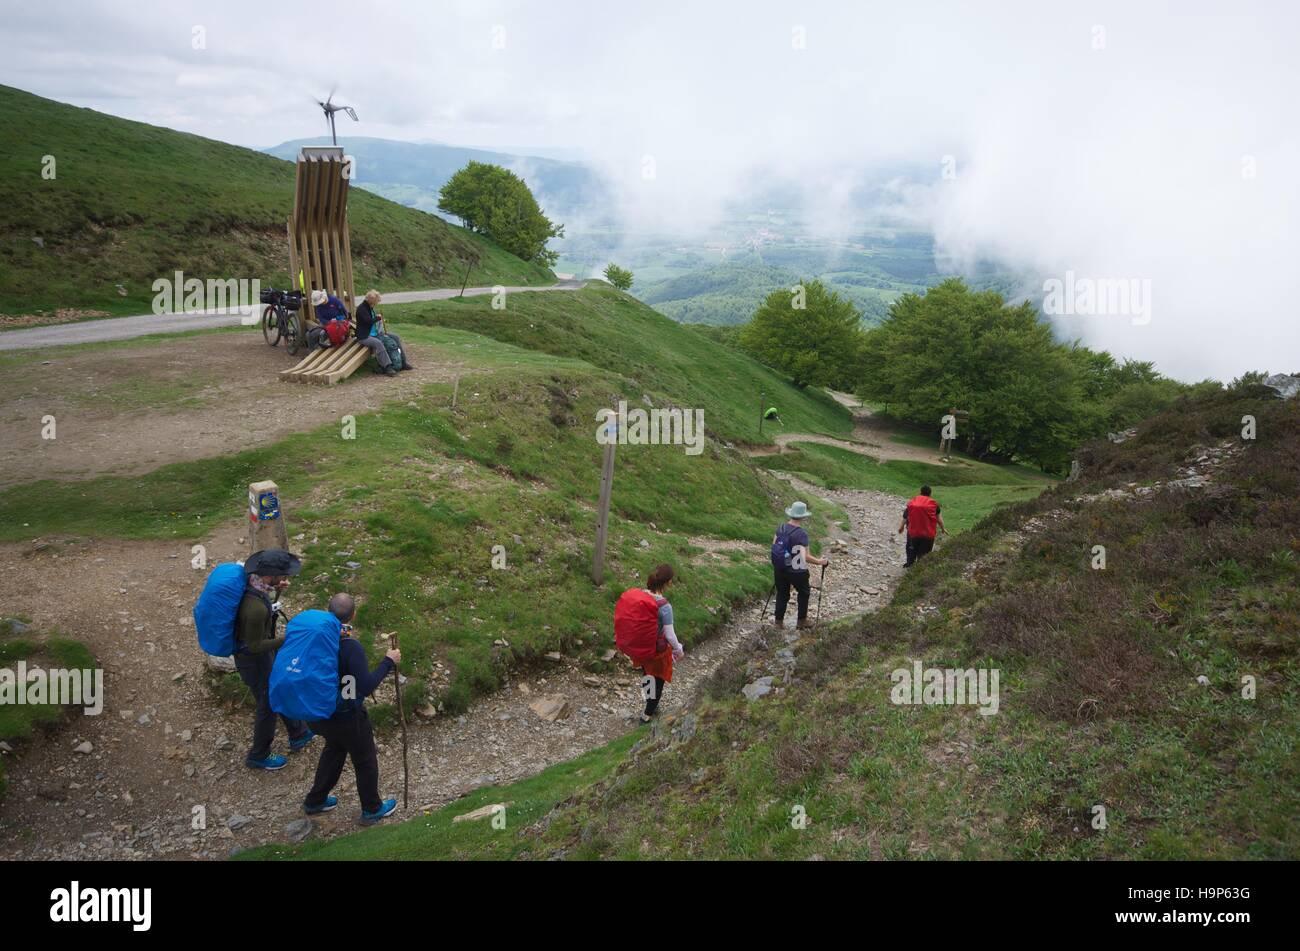 Pilgrims walking on the Ronvesvalles pass, Pilgrim road to Santiago de Compostela - Stock Image